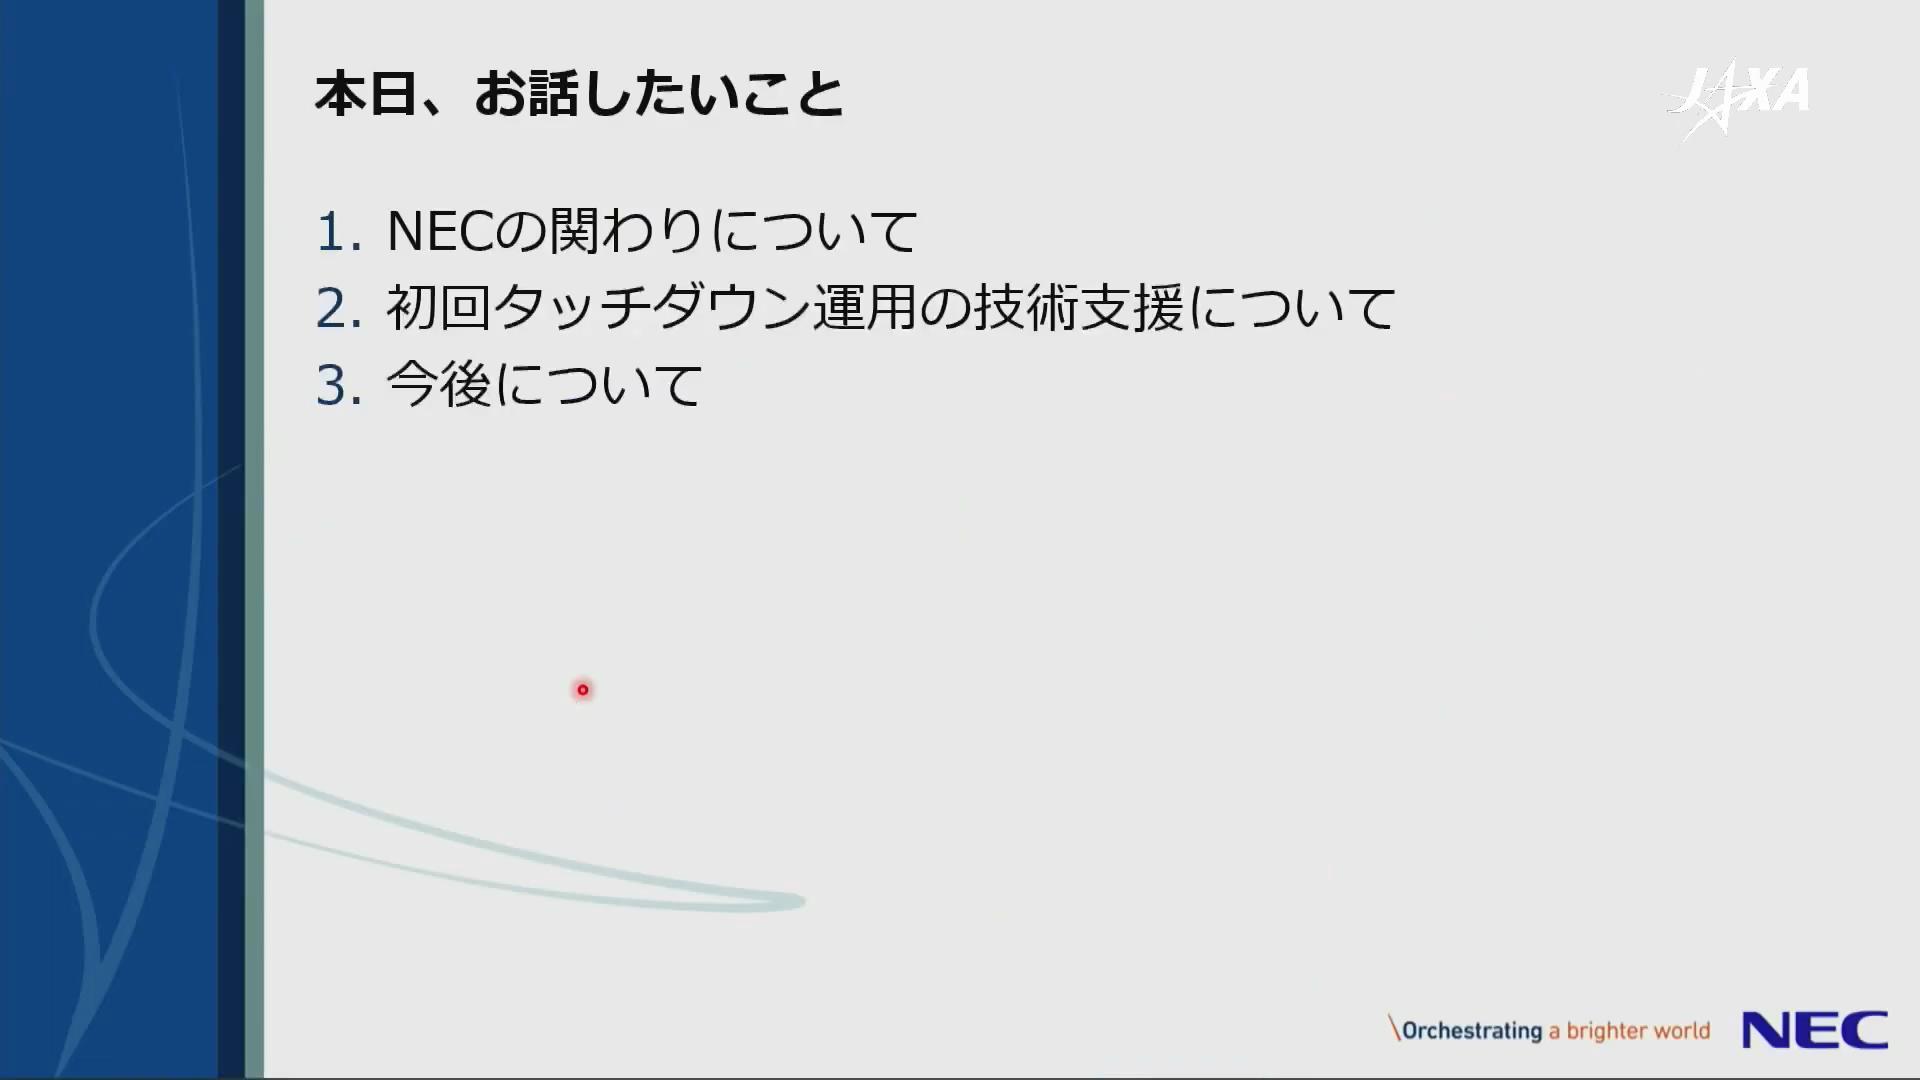 f:id:Imamura:20191219211802p:plain